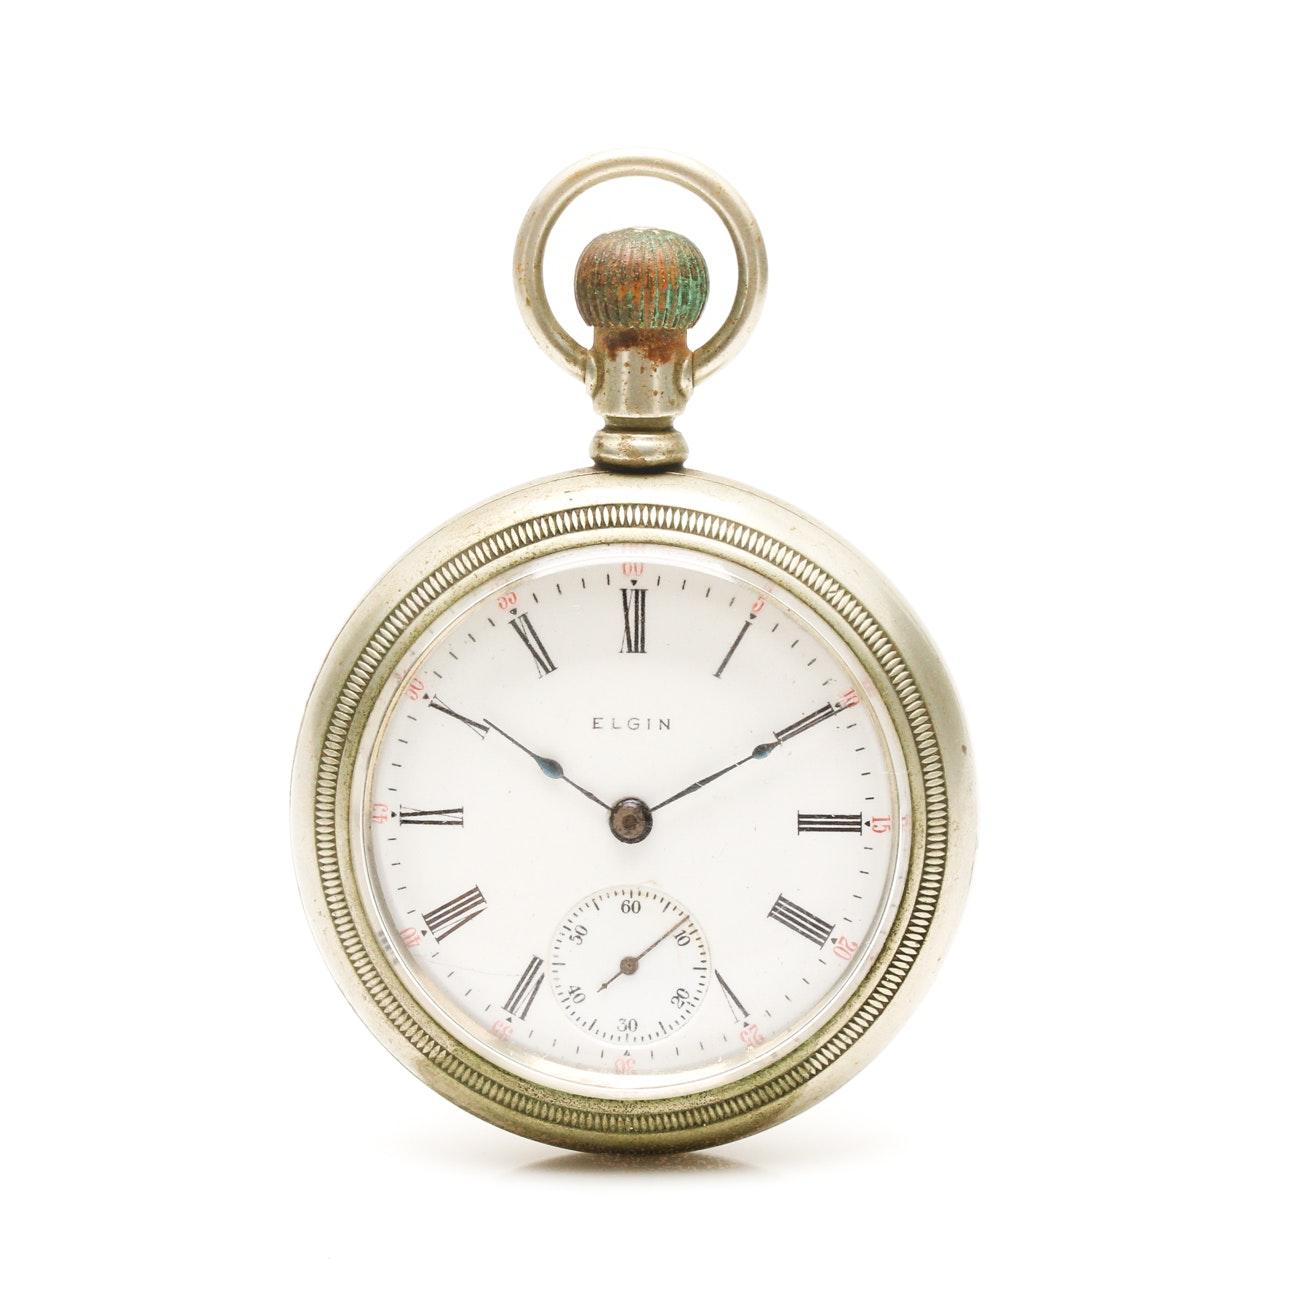 Antique Elgin Open Face Pocketwatch